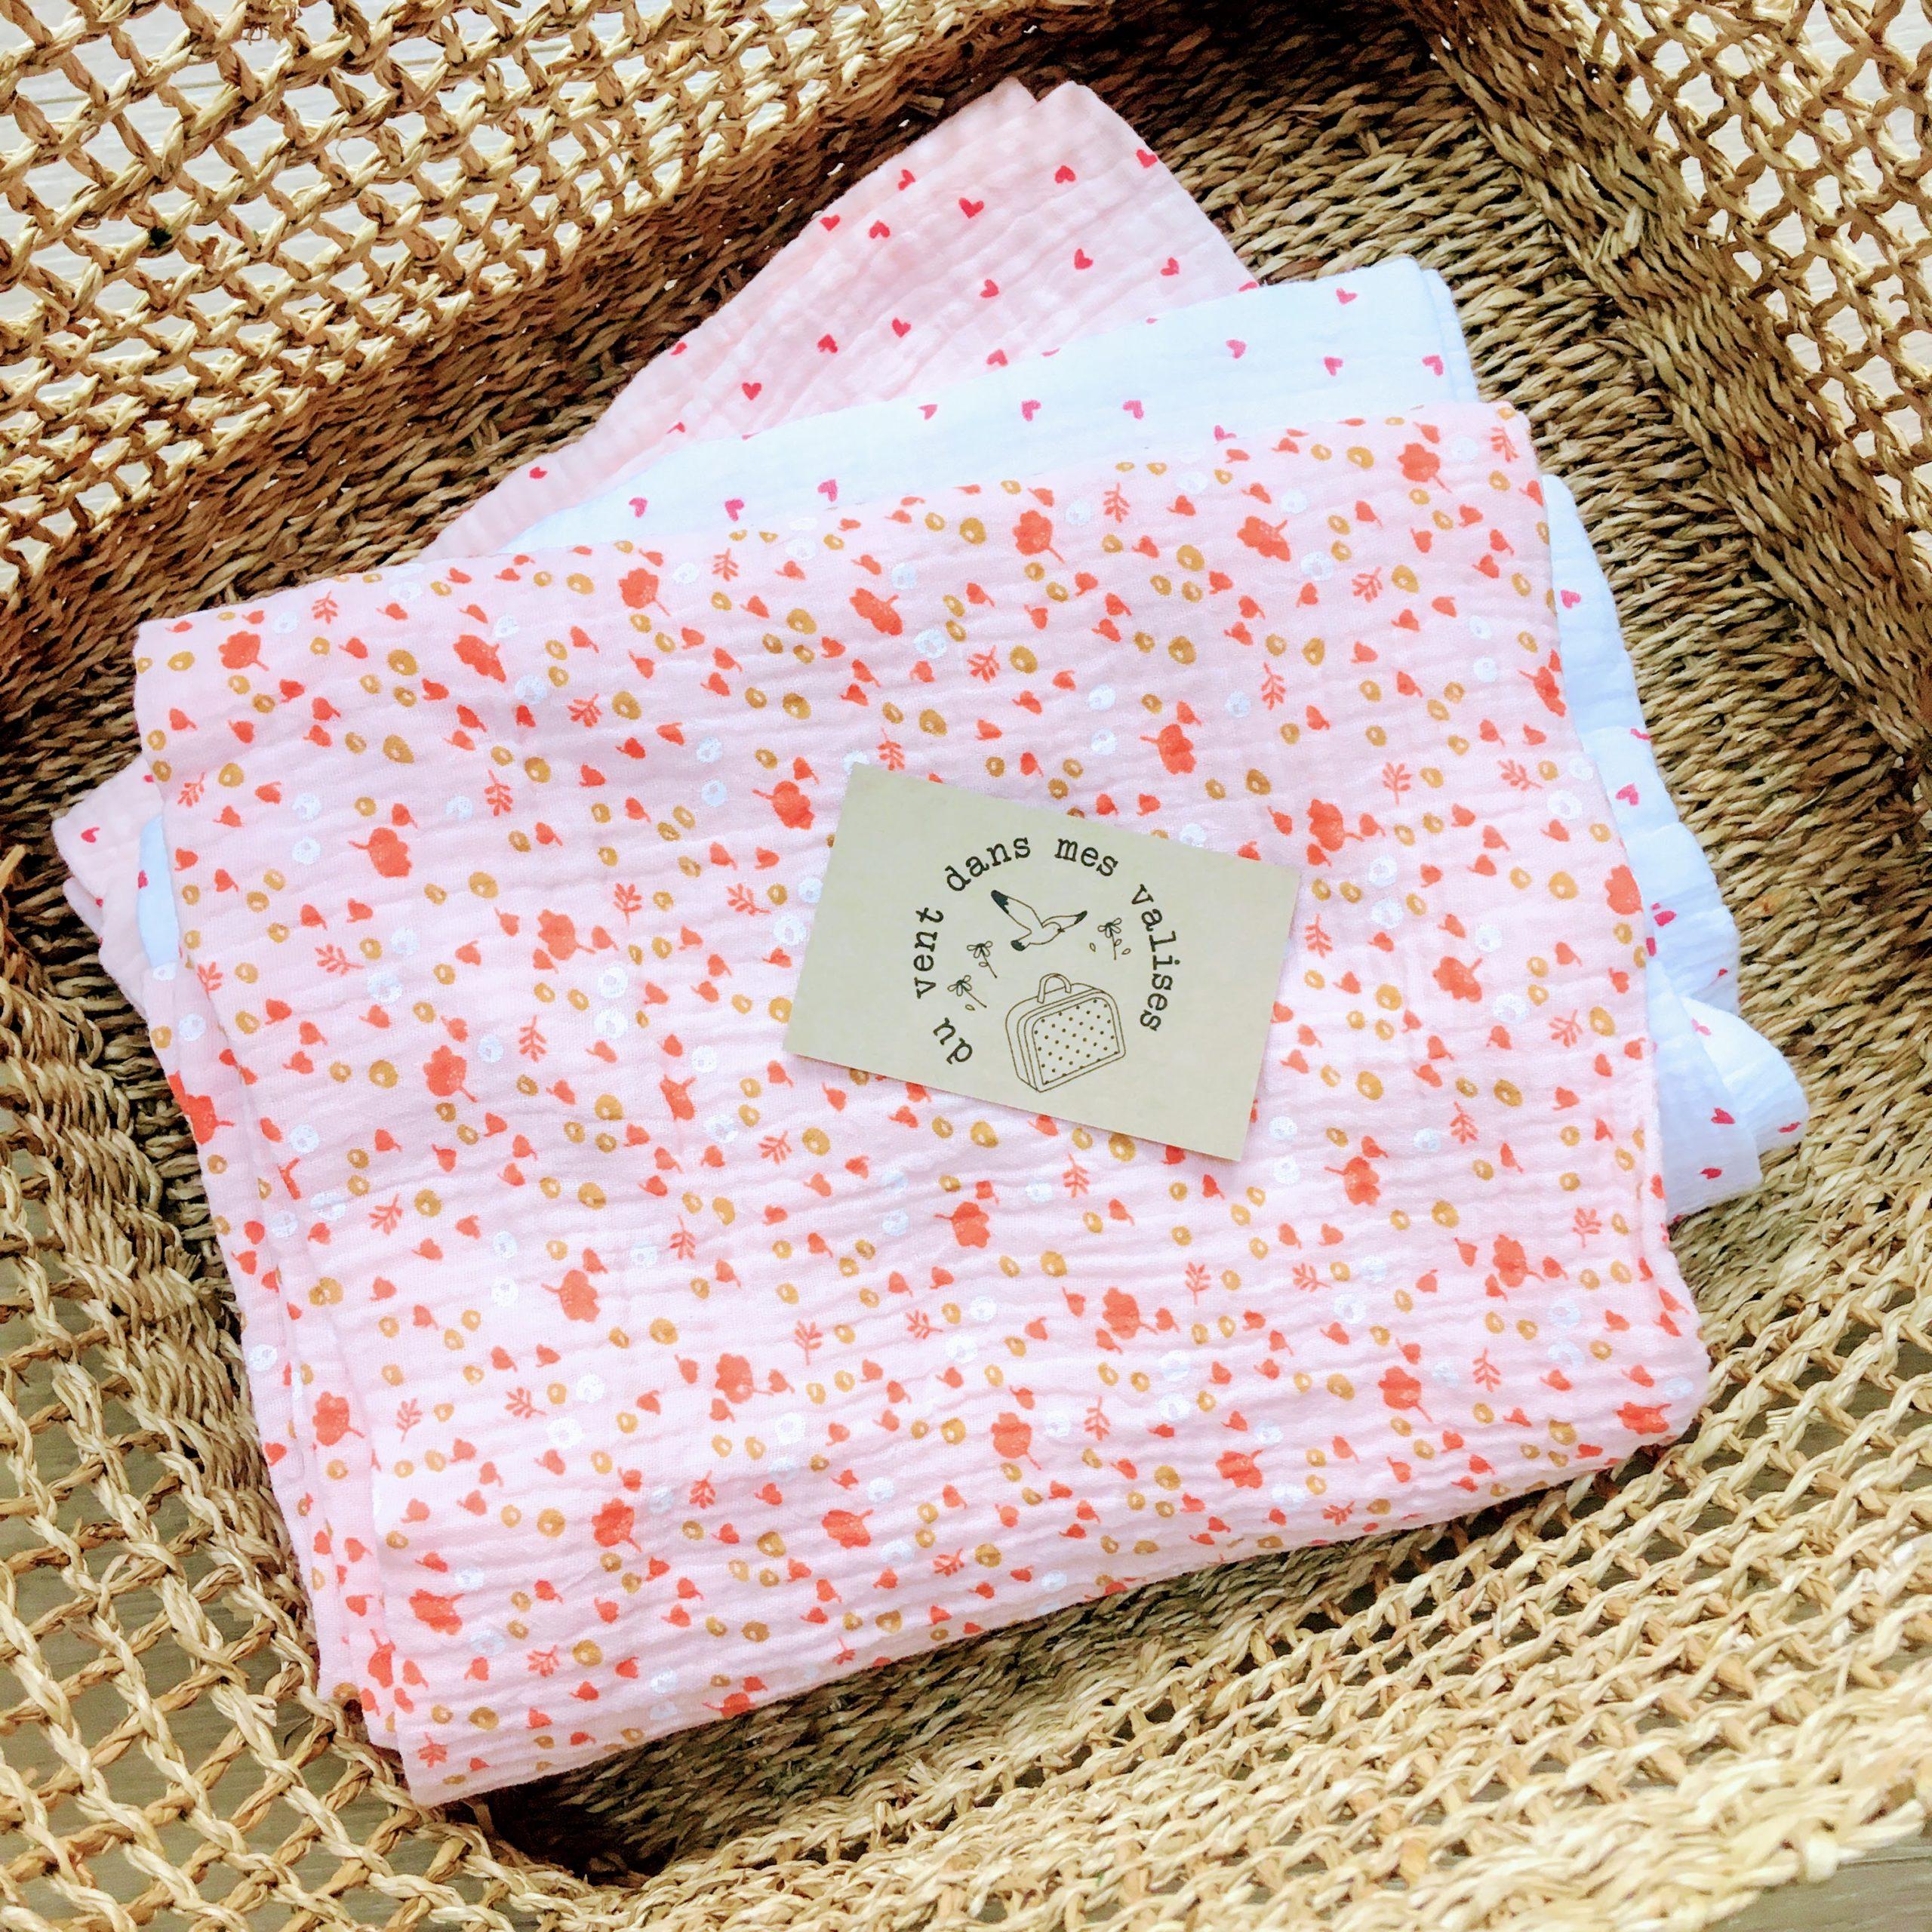 du vent dans mes valises - snood si doux milles fleurs rose made in France